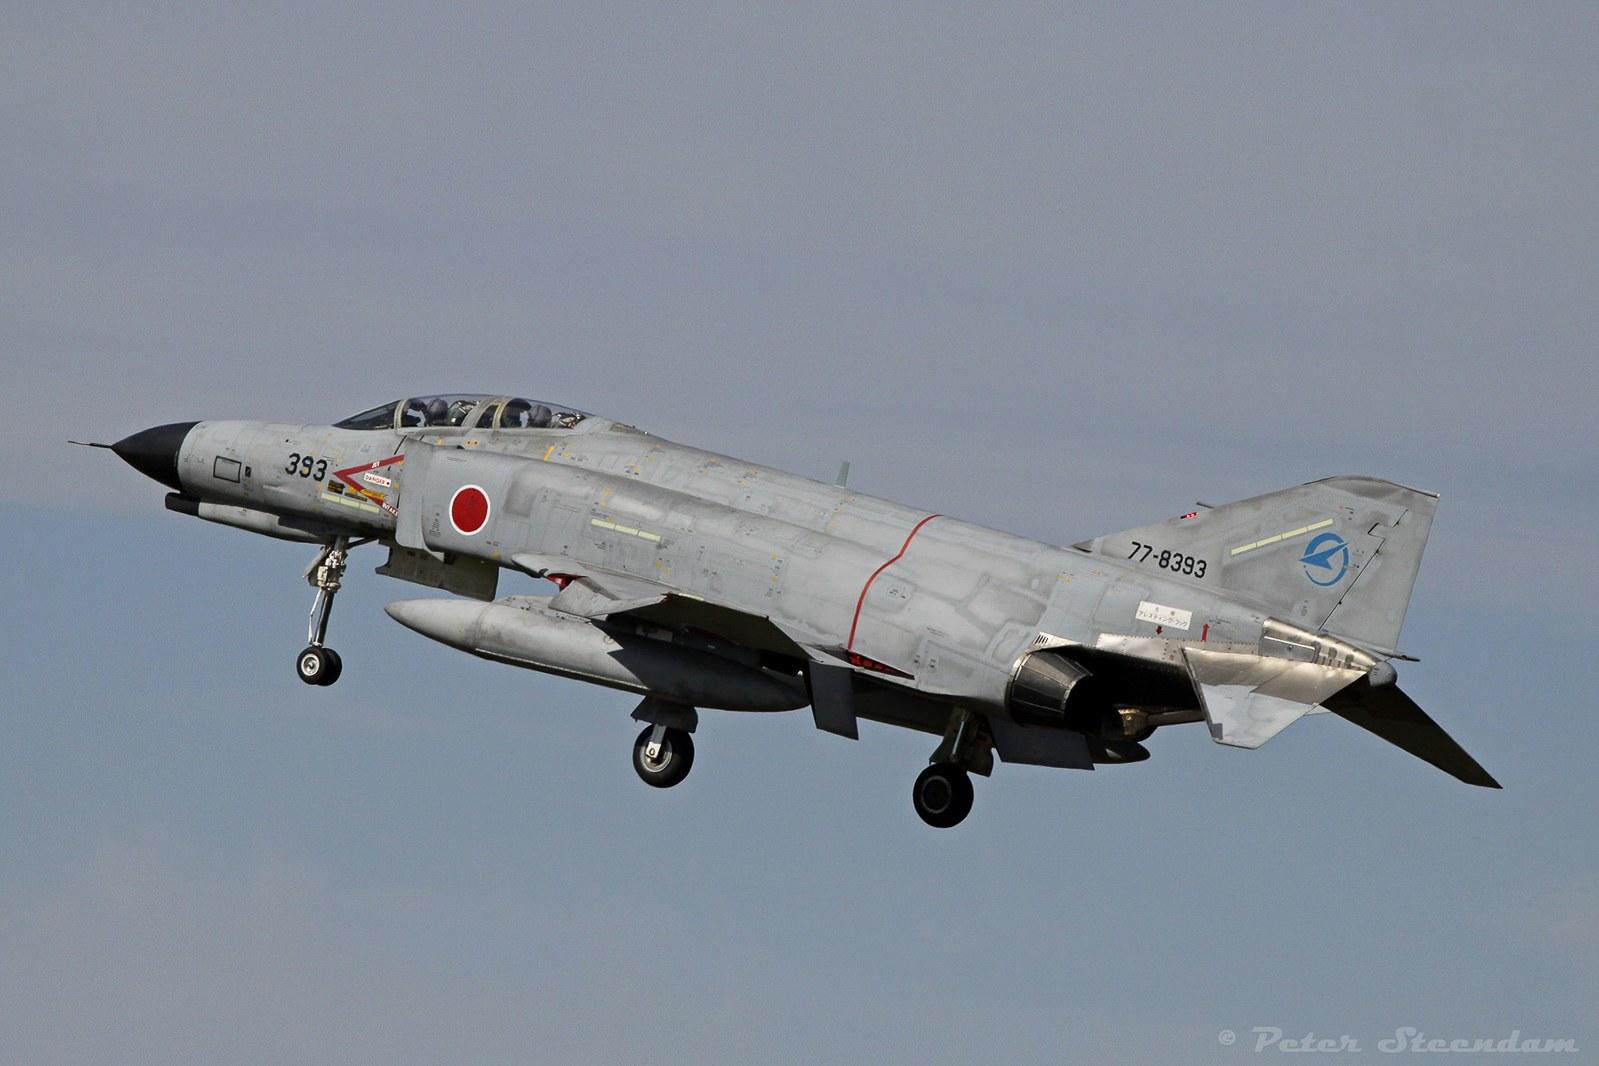 f-4ej-77-8393-hkj-landing_mod_fb